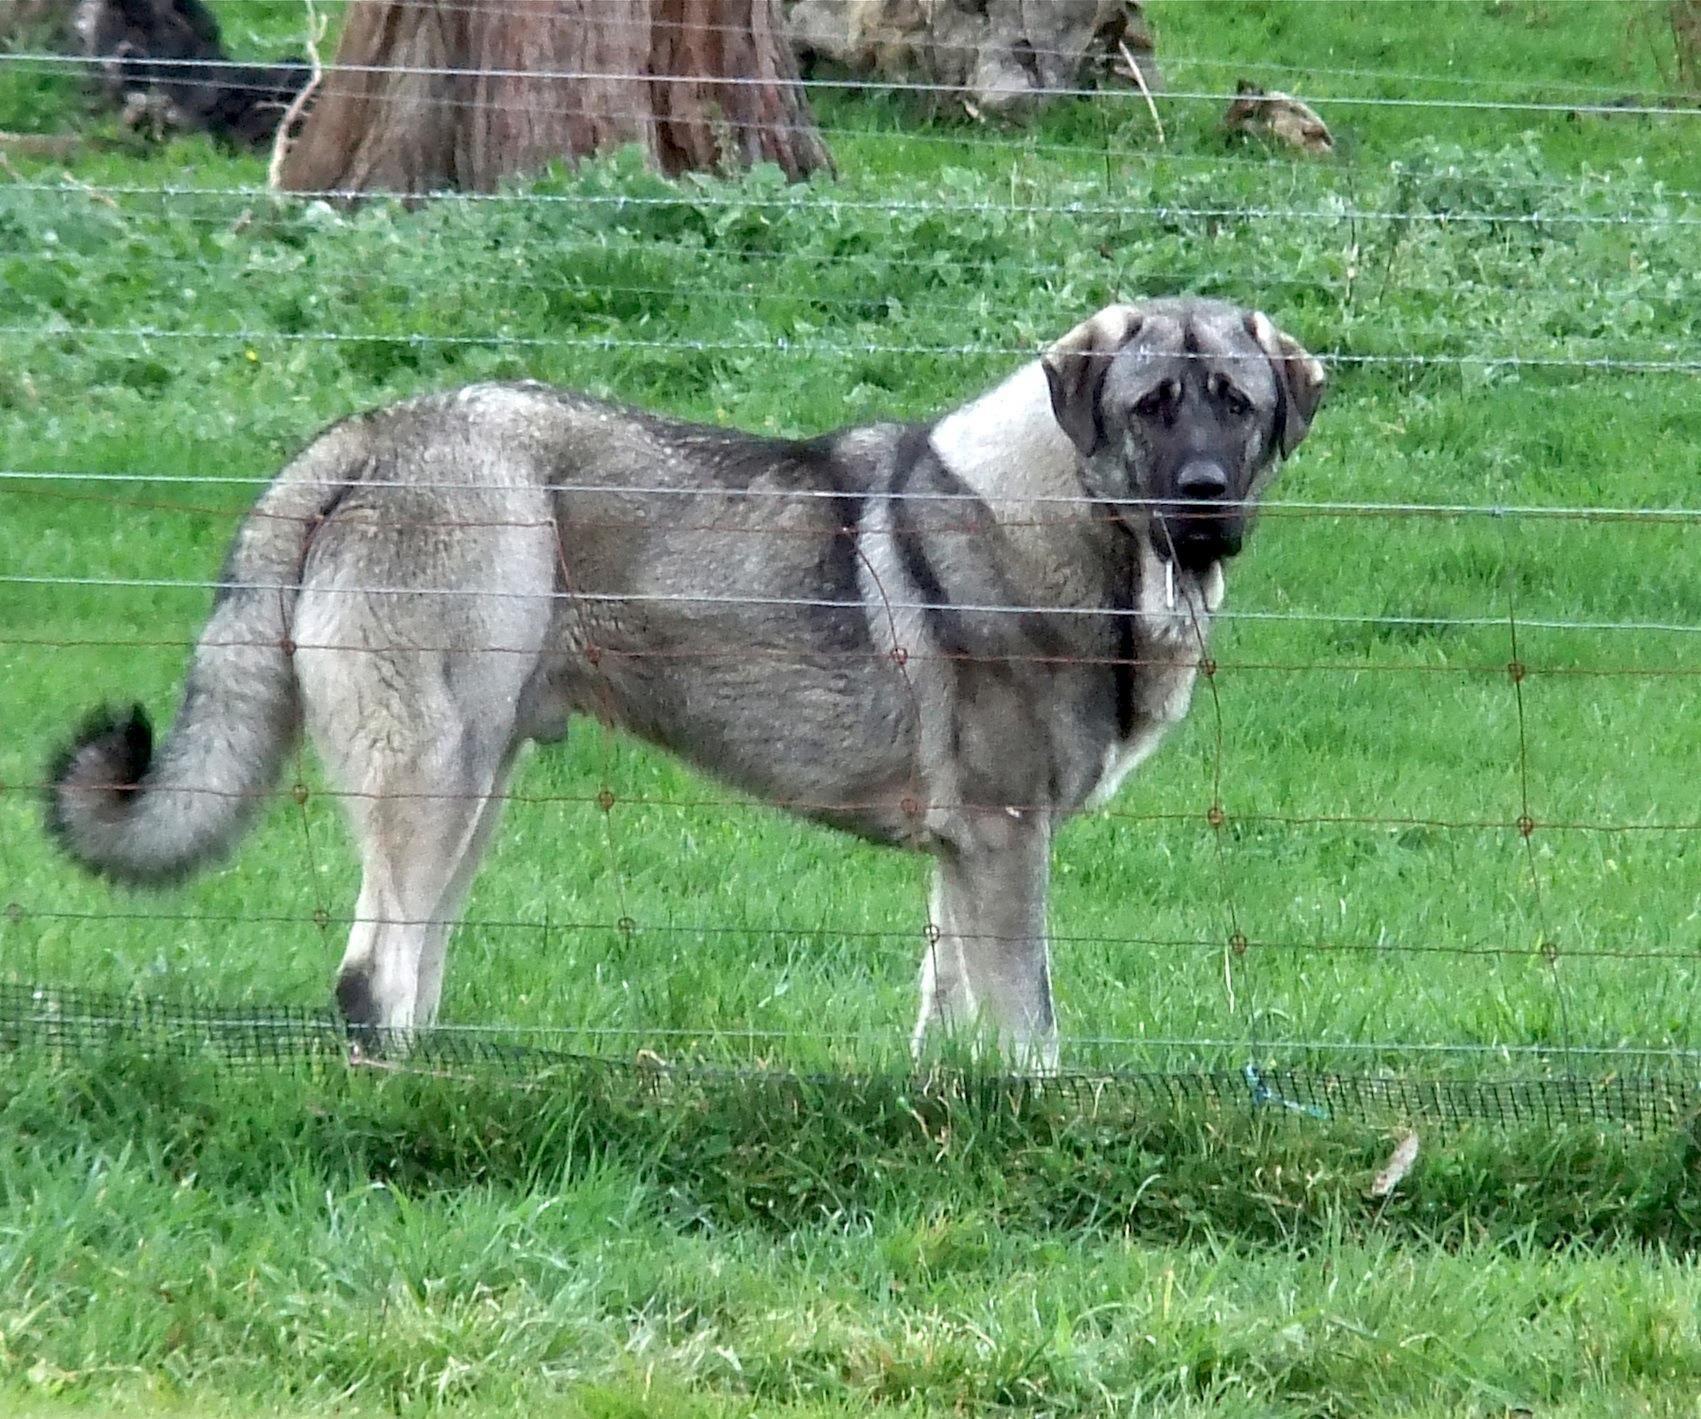 wolf sable Anatolian Shepherd Dog livestock guardian dog